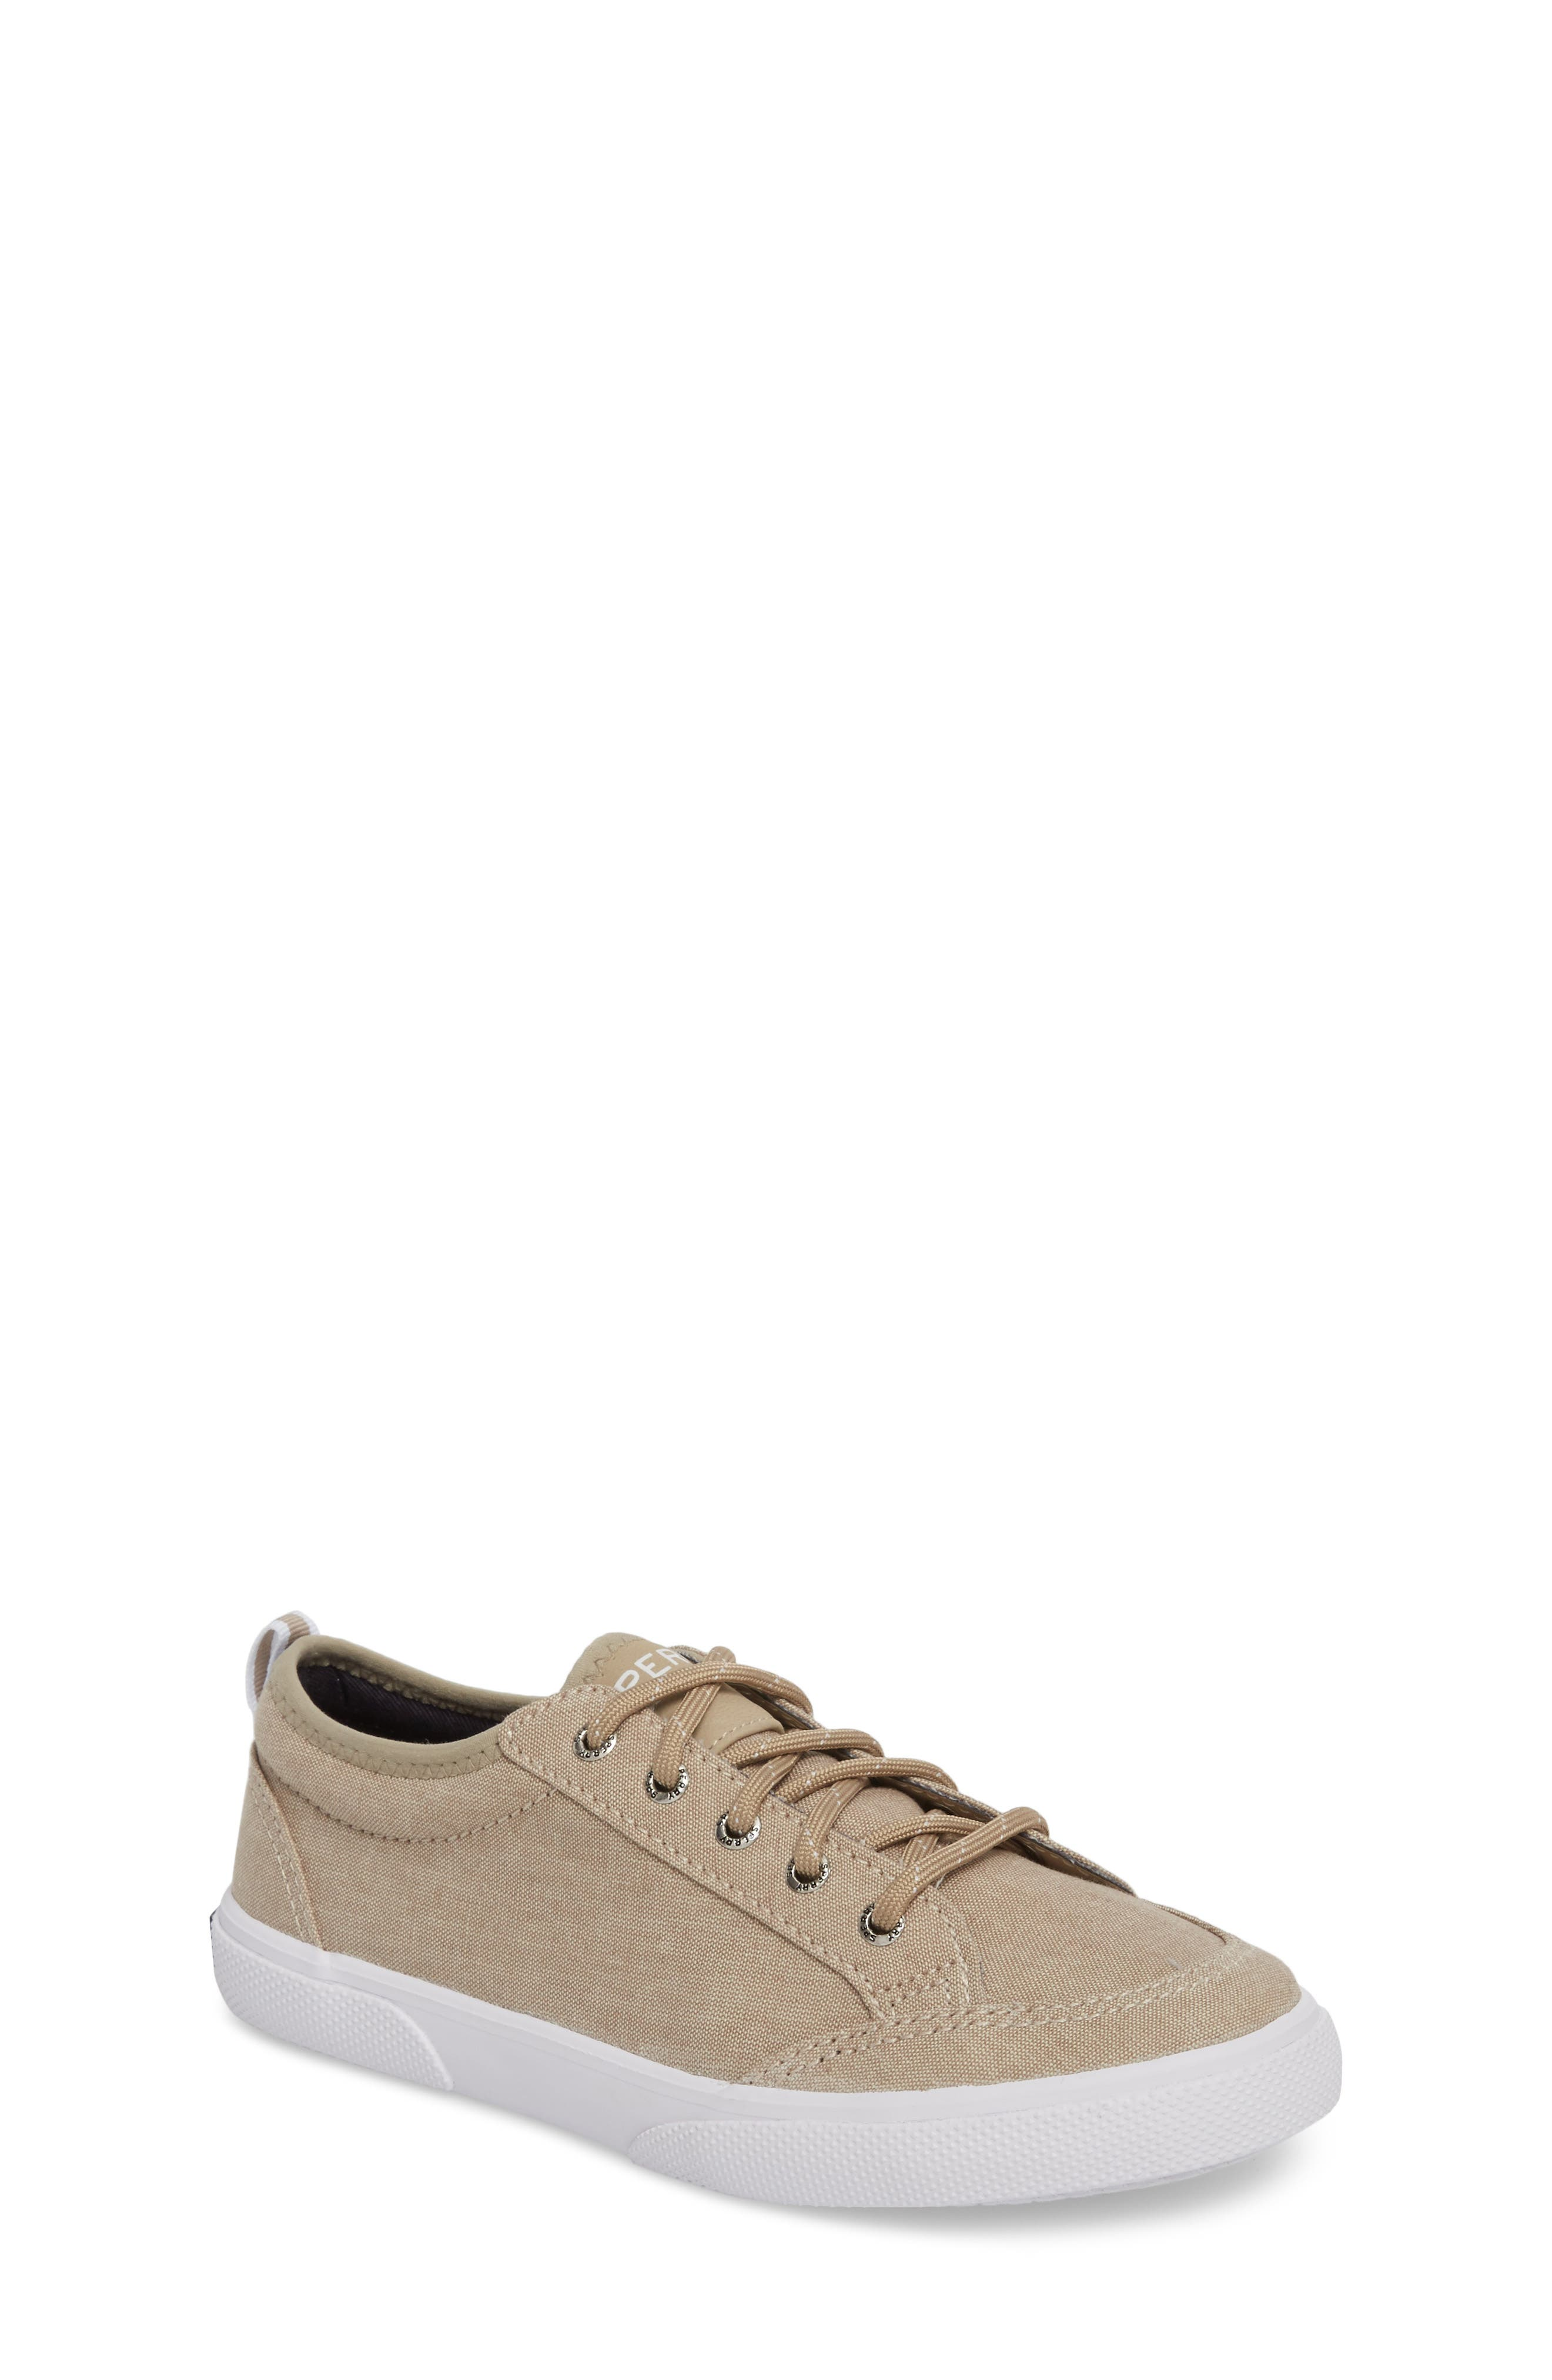 Deckfin Sneaker,                             Main thumbnail 1, color,                             Khaki